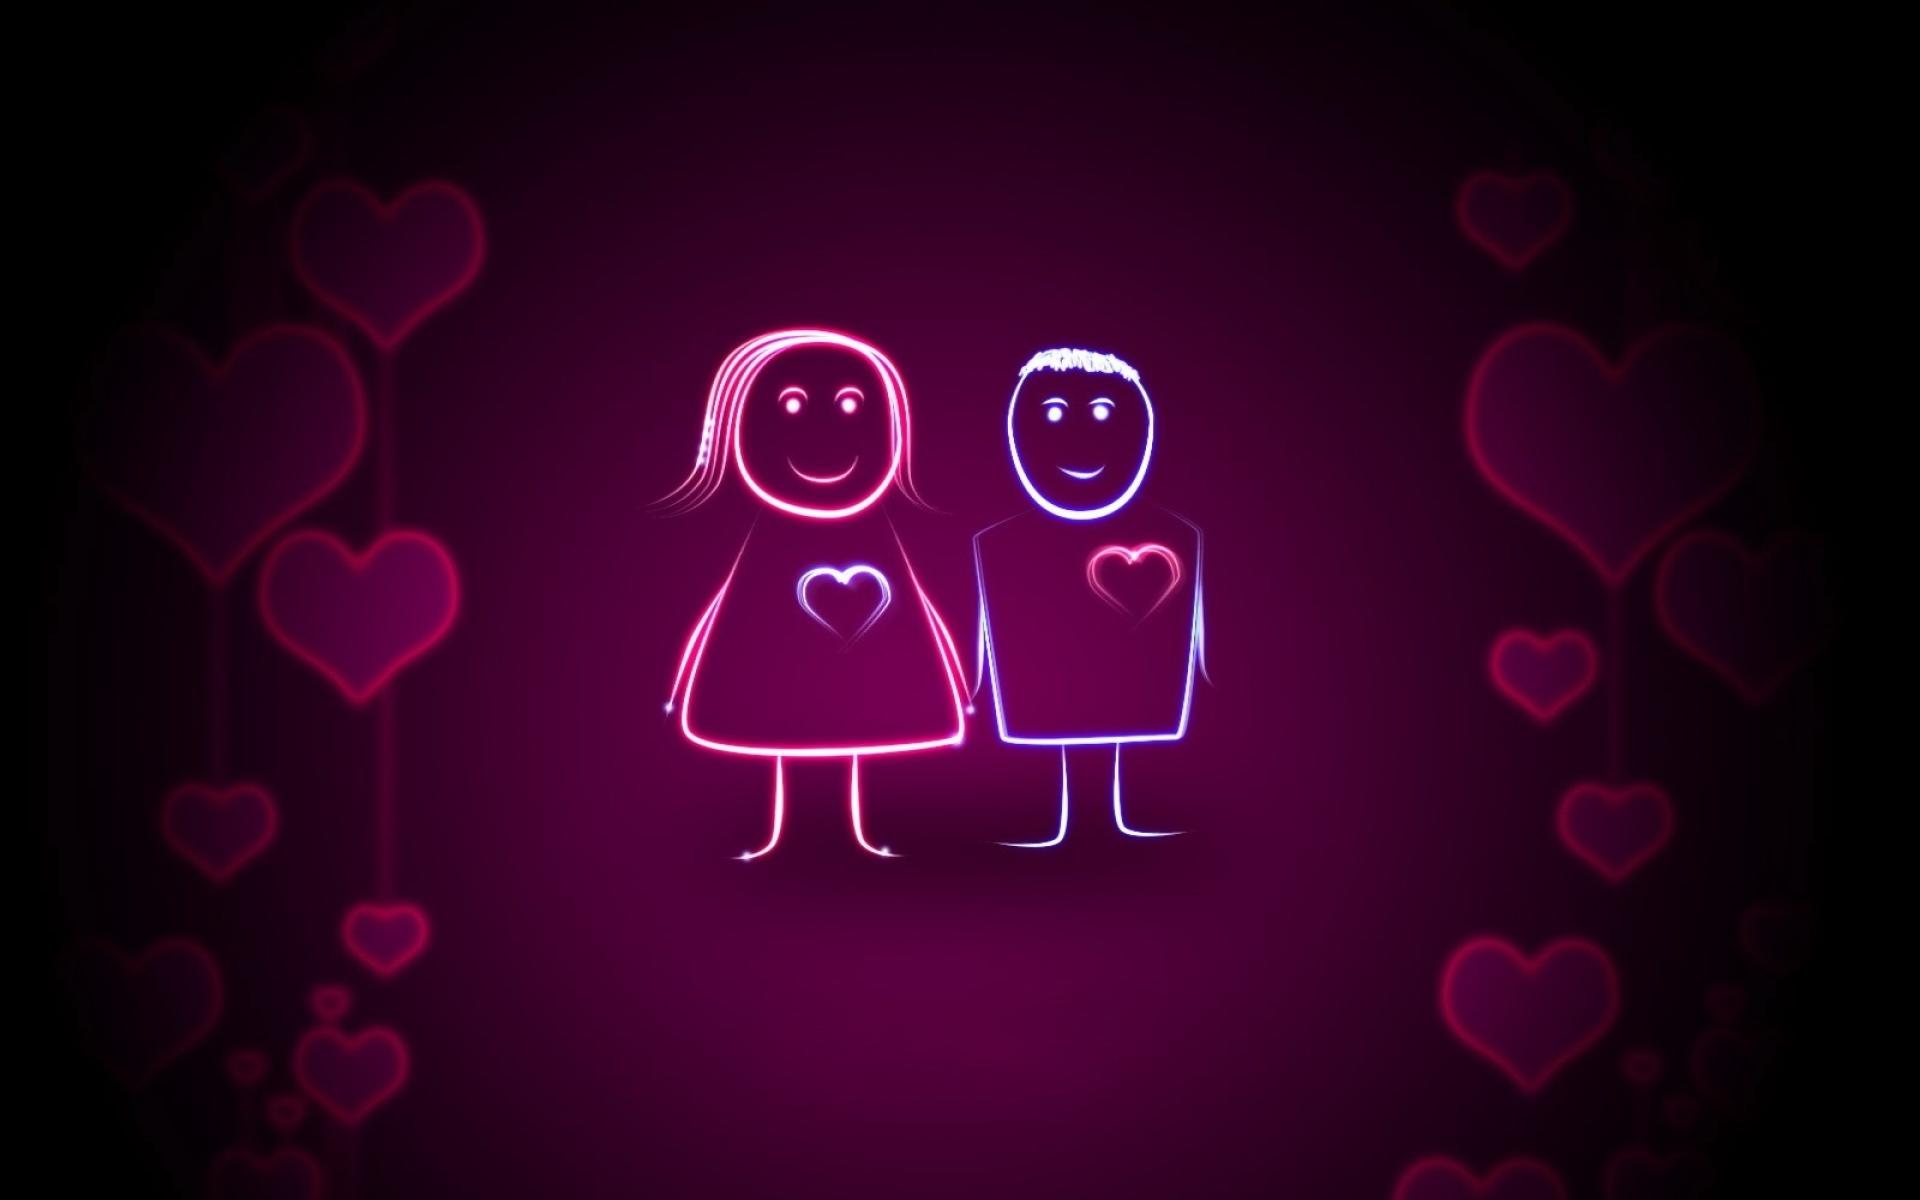 Картинки Пара, сердце, свет, фон фото и обои на рабочий стол